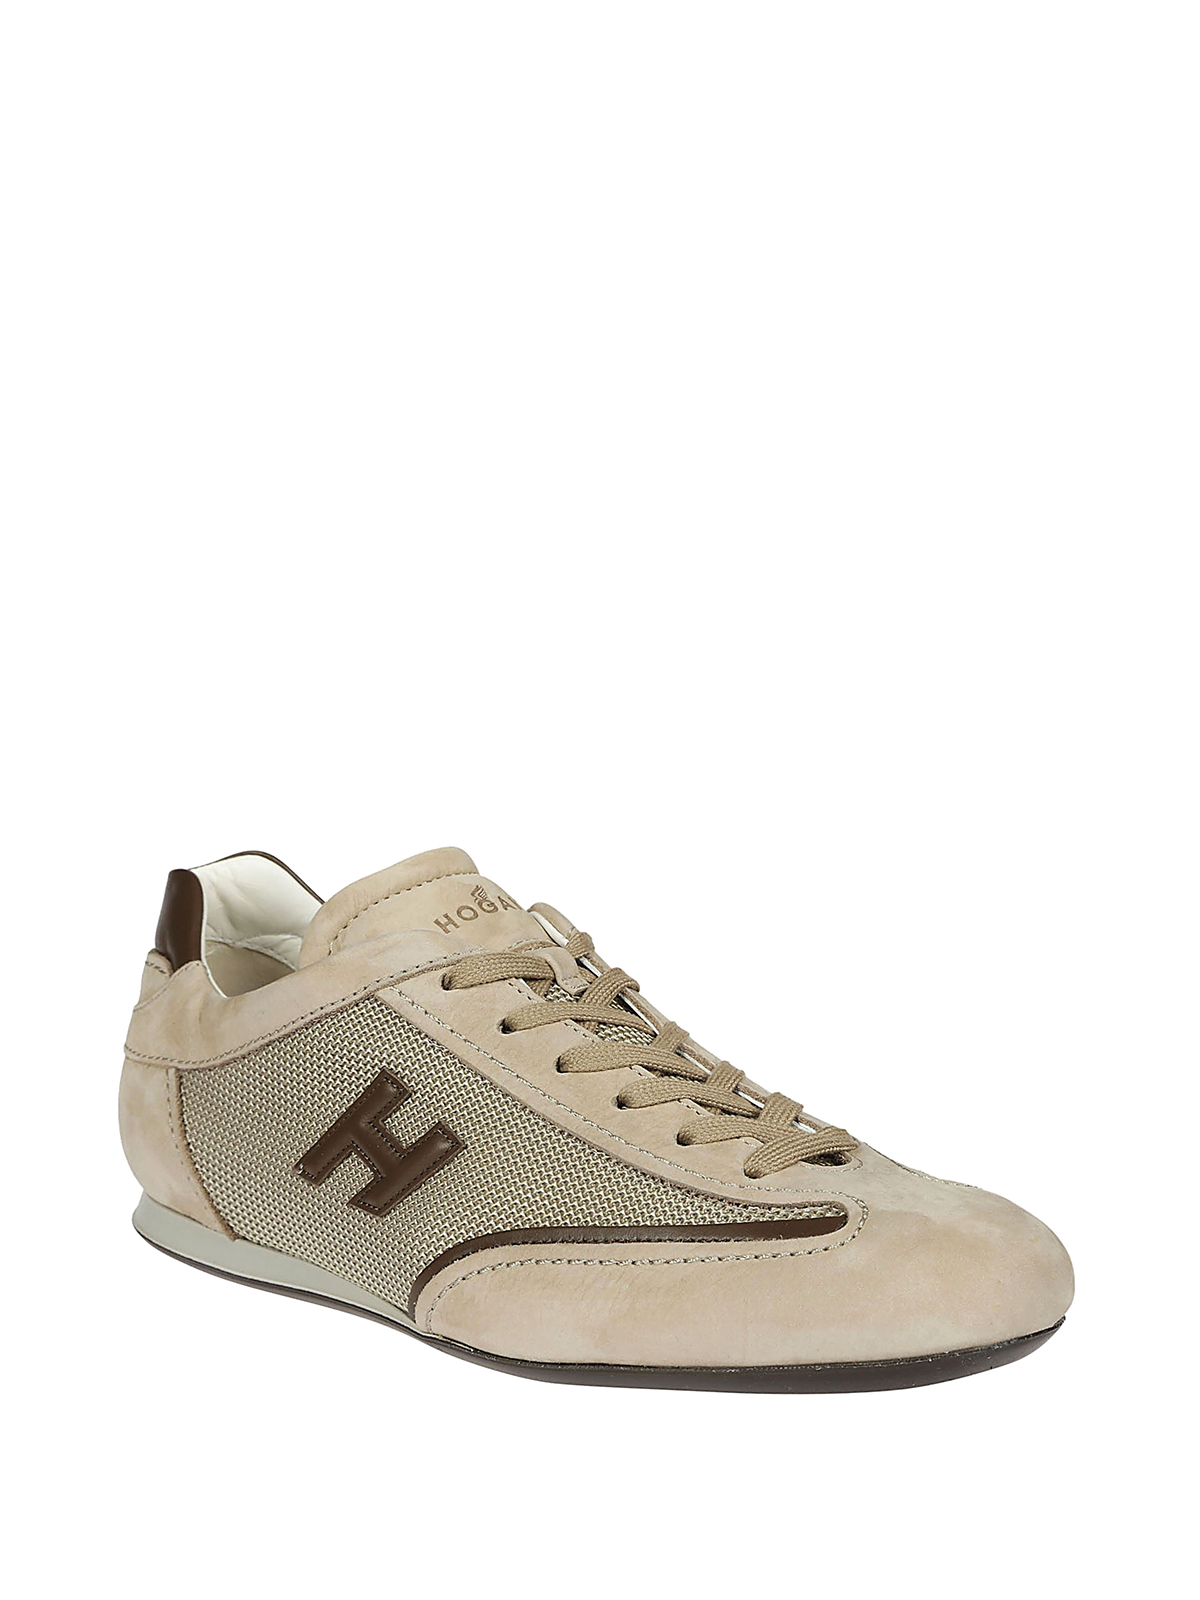 Sneakers Hogan - Sneaker Olympia in nabuk beige - HXM0520I974IGK0PCL